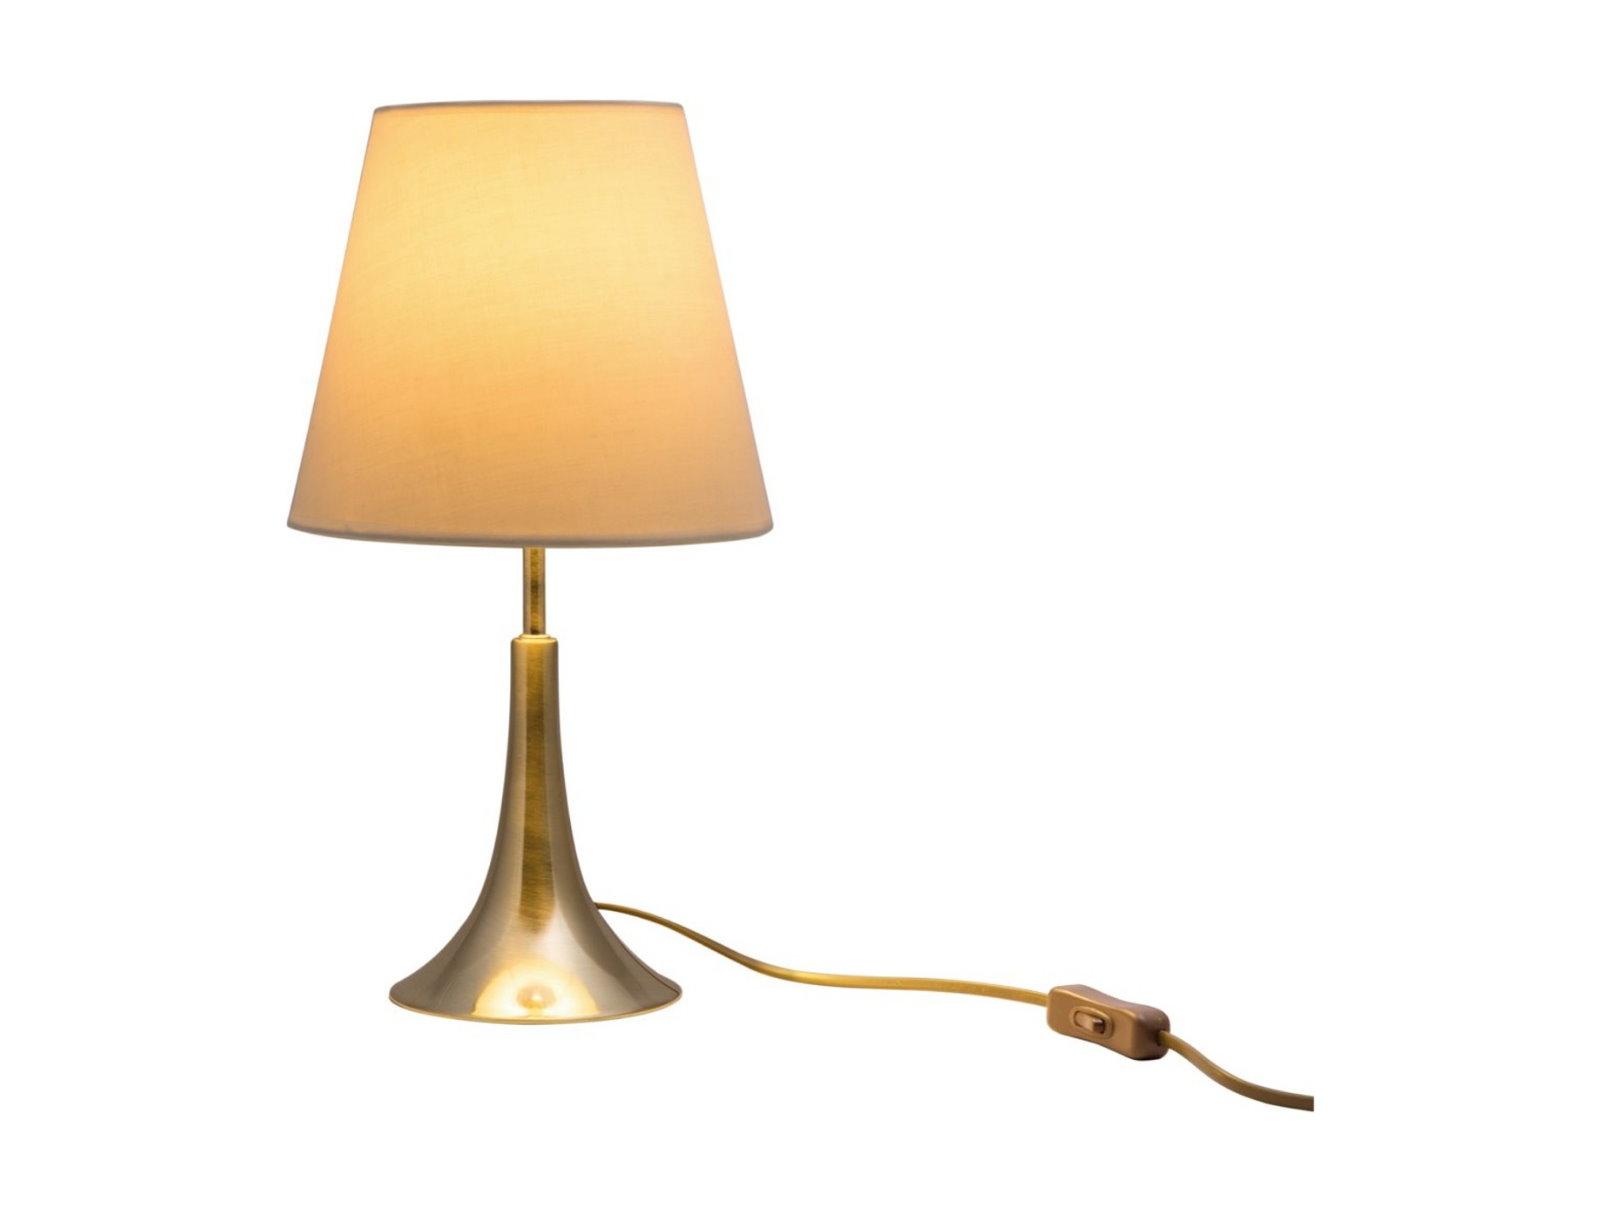 Schlafzimmer Lampe Messing Tischlampe Pantin Loberon Coming Home